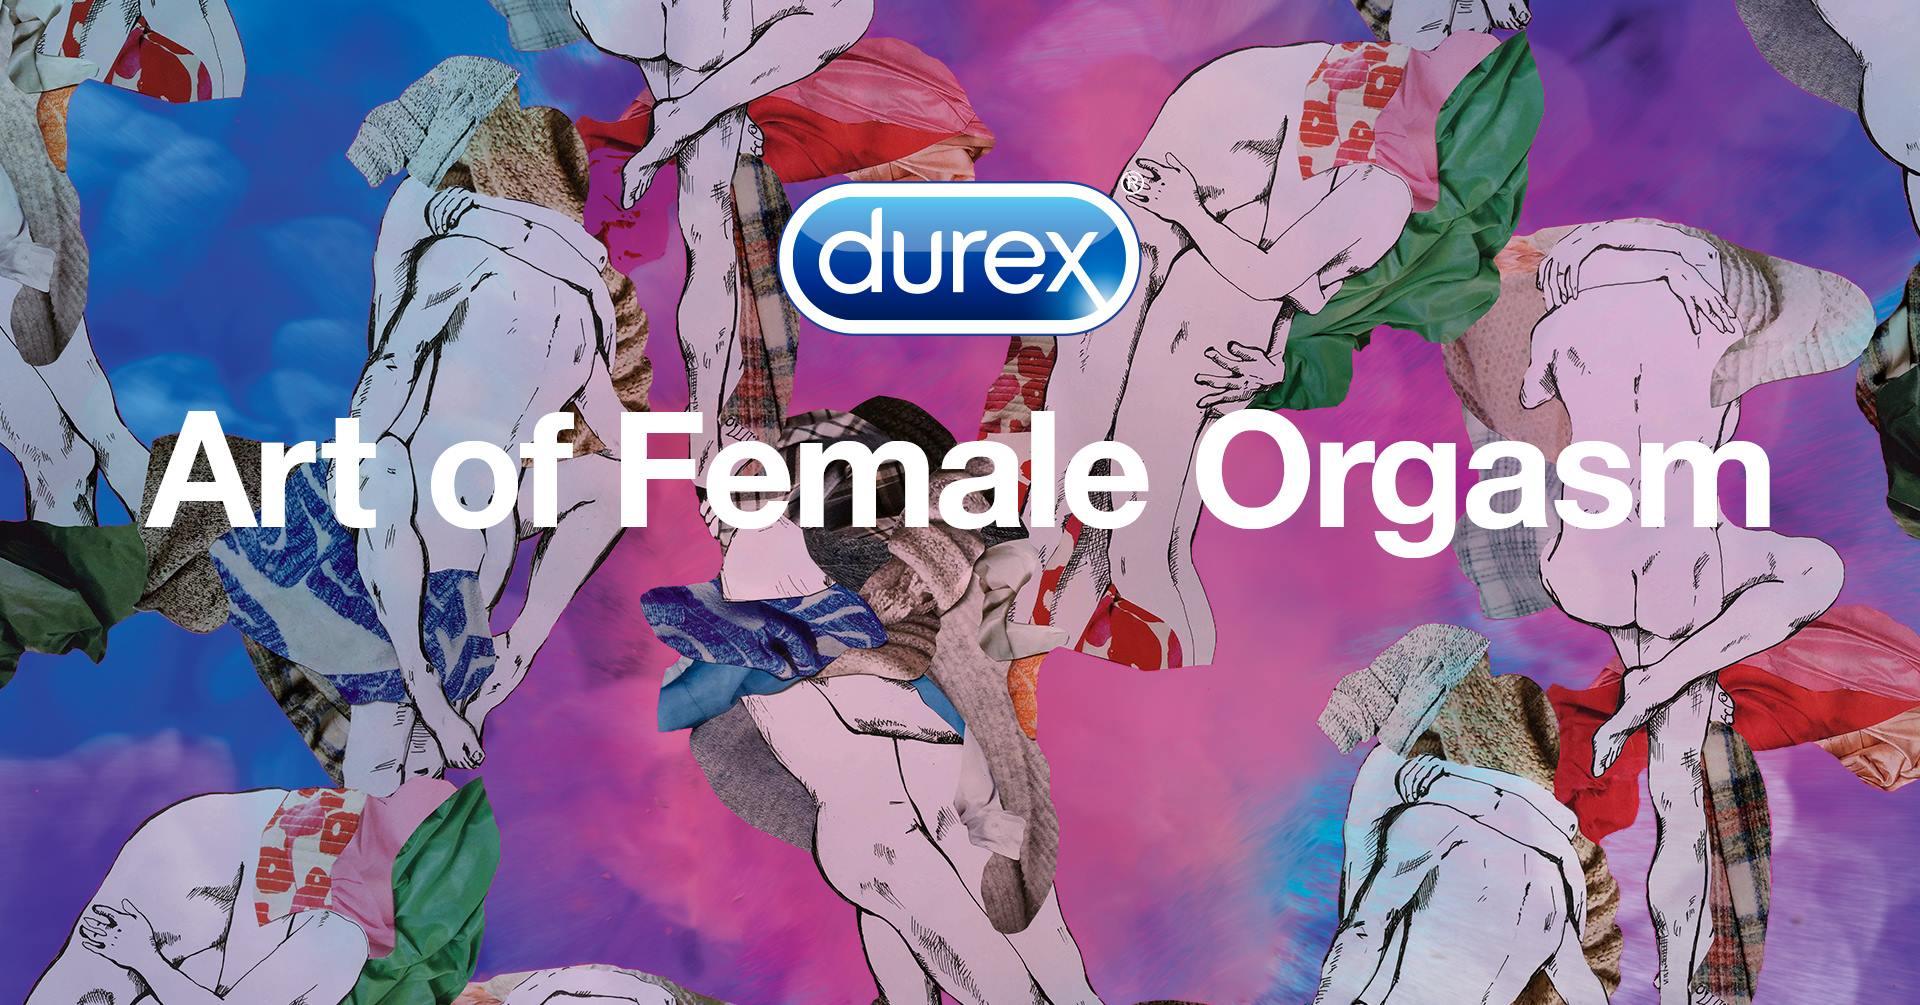 Art of Female Orgasm. December 16-22